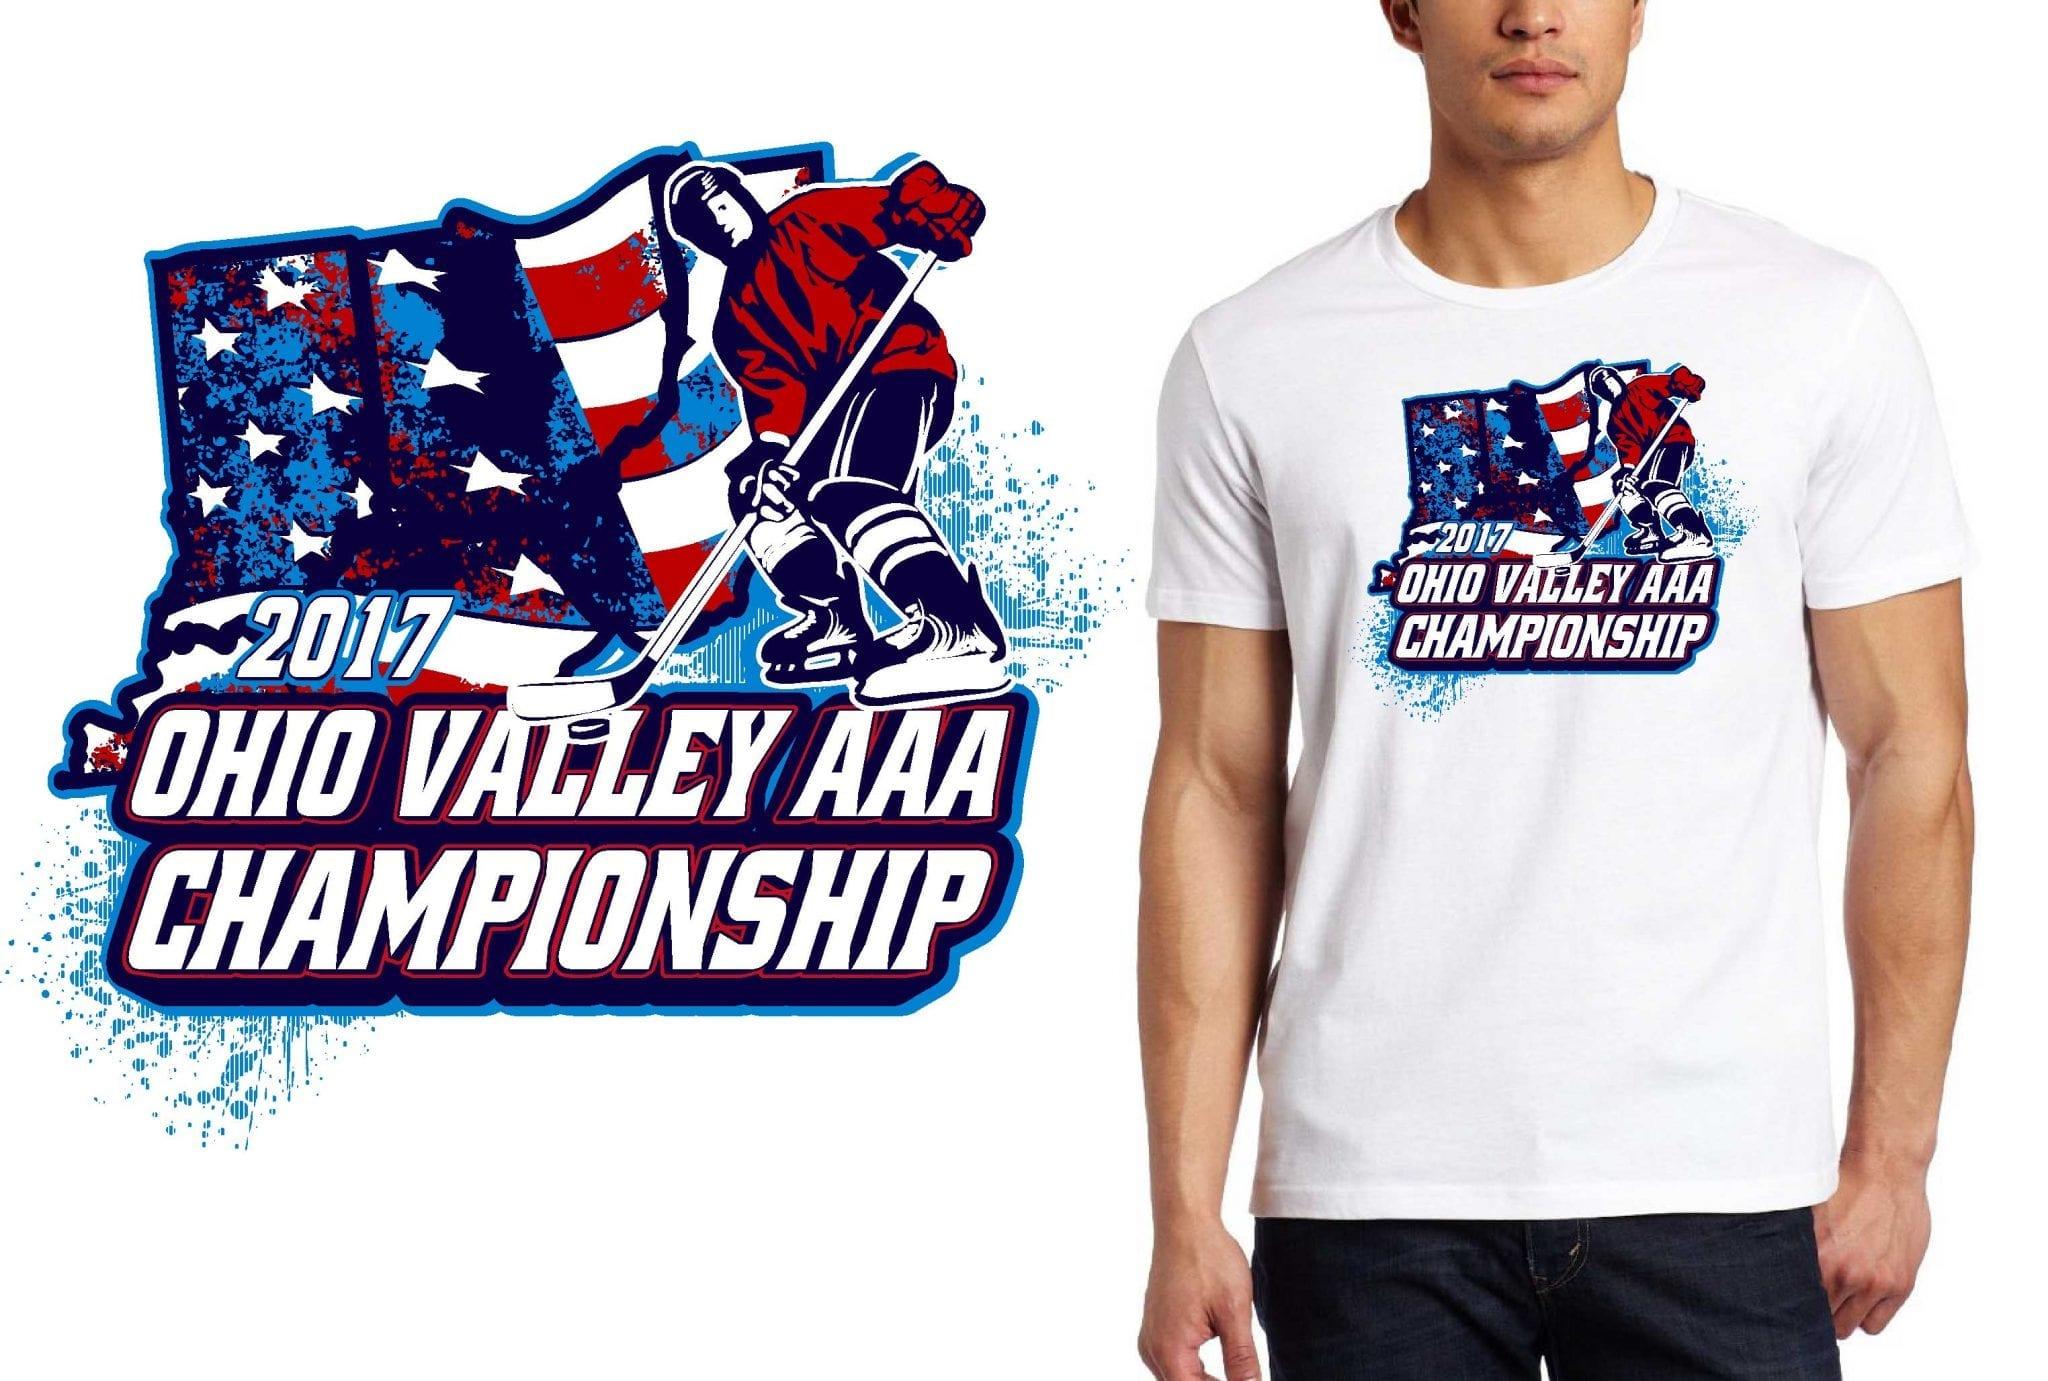 HOCKEY T SHIRT LOGO DESIGN Ohio-Valley-AAA-Championships BY UrArtStudio